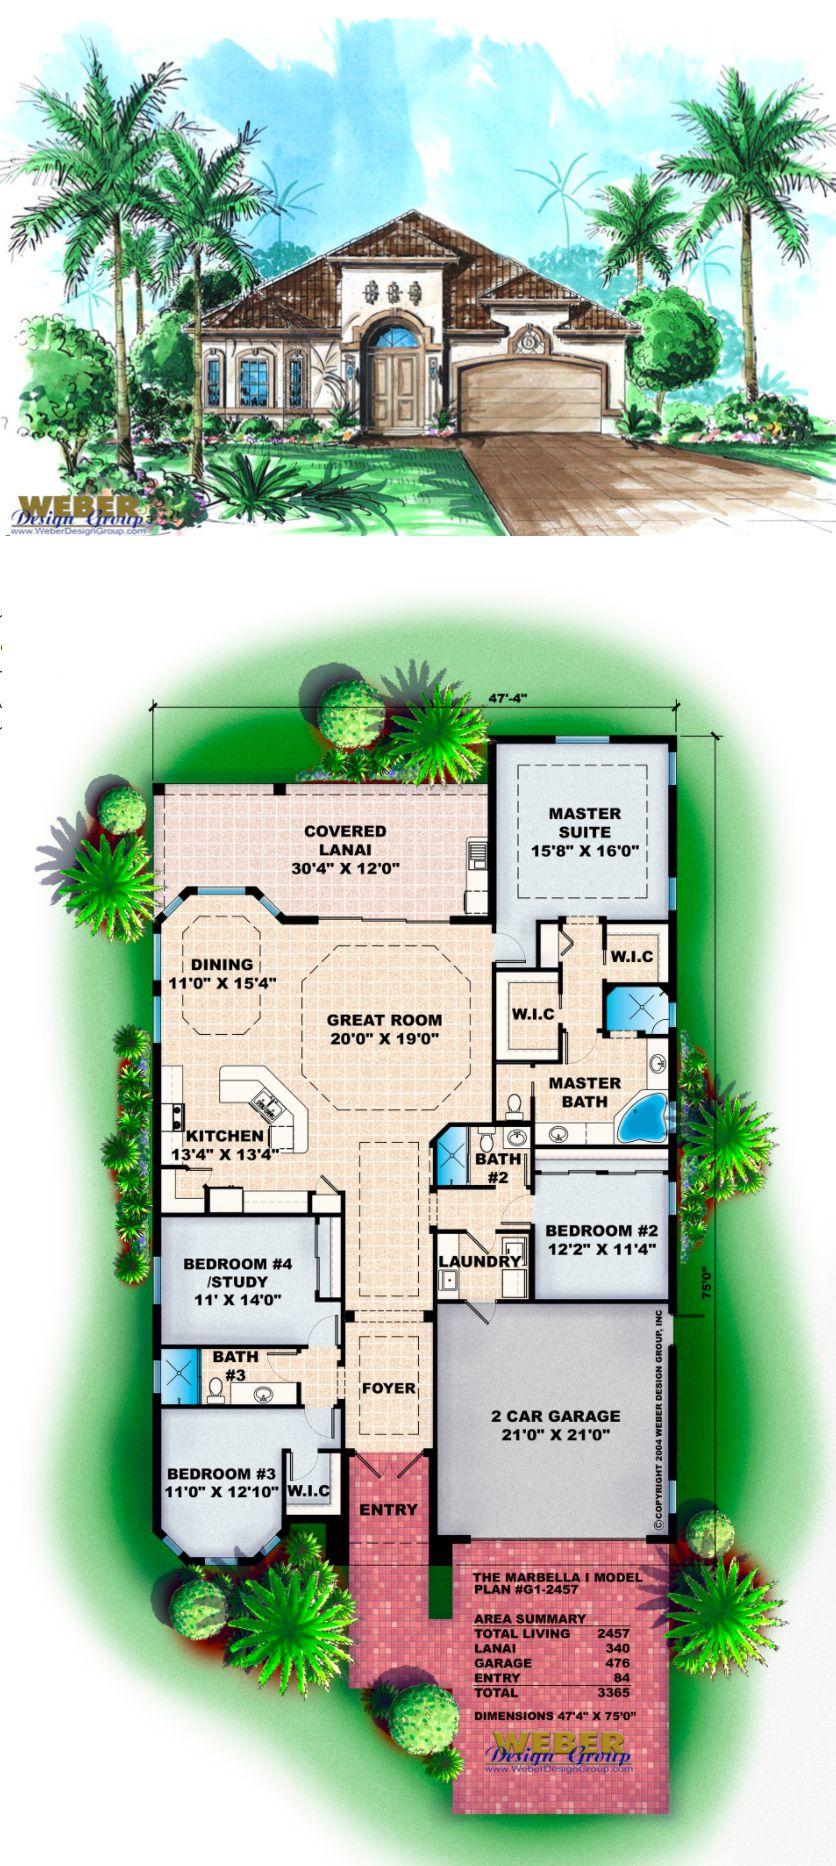 Mediterranean House Plan Small Narrow Coastal Lot Home Floor Plan Mediterranean House Plan Mediterranean Homes Mediterranean Decor